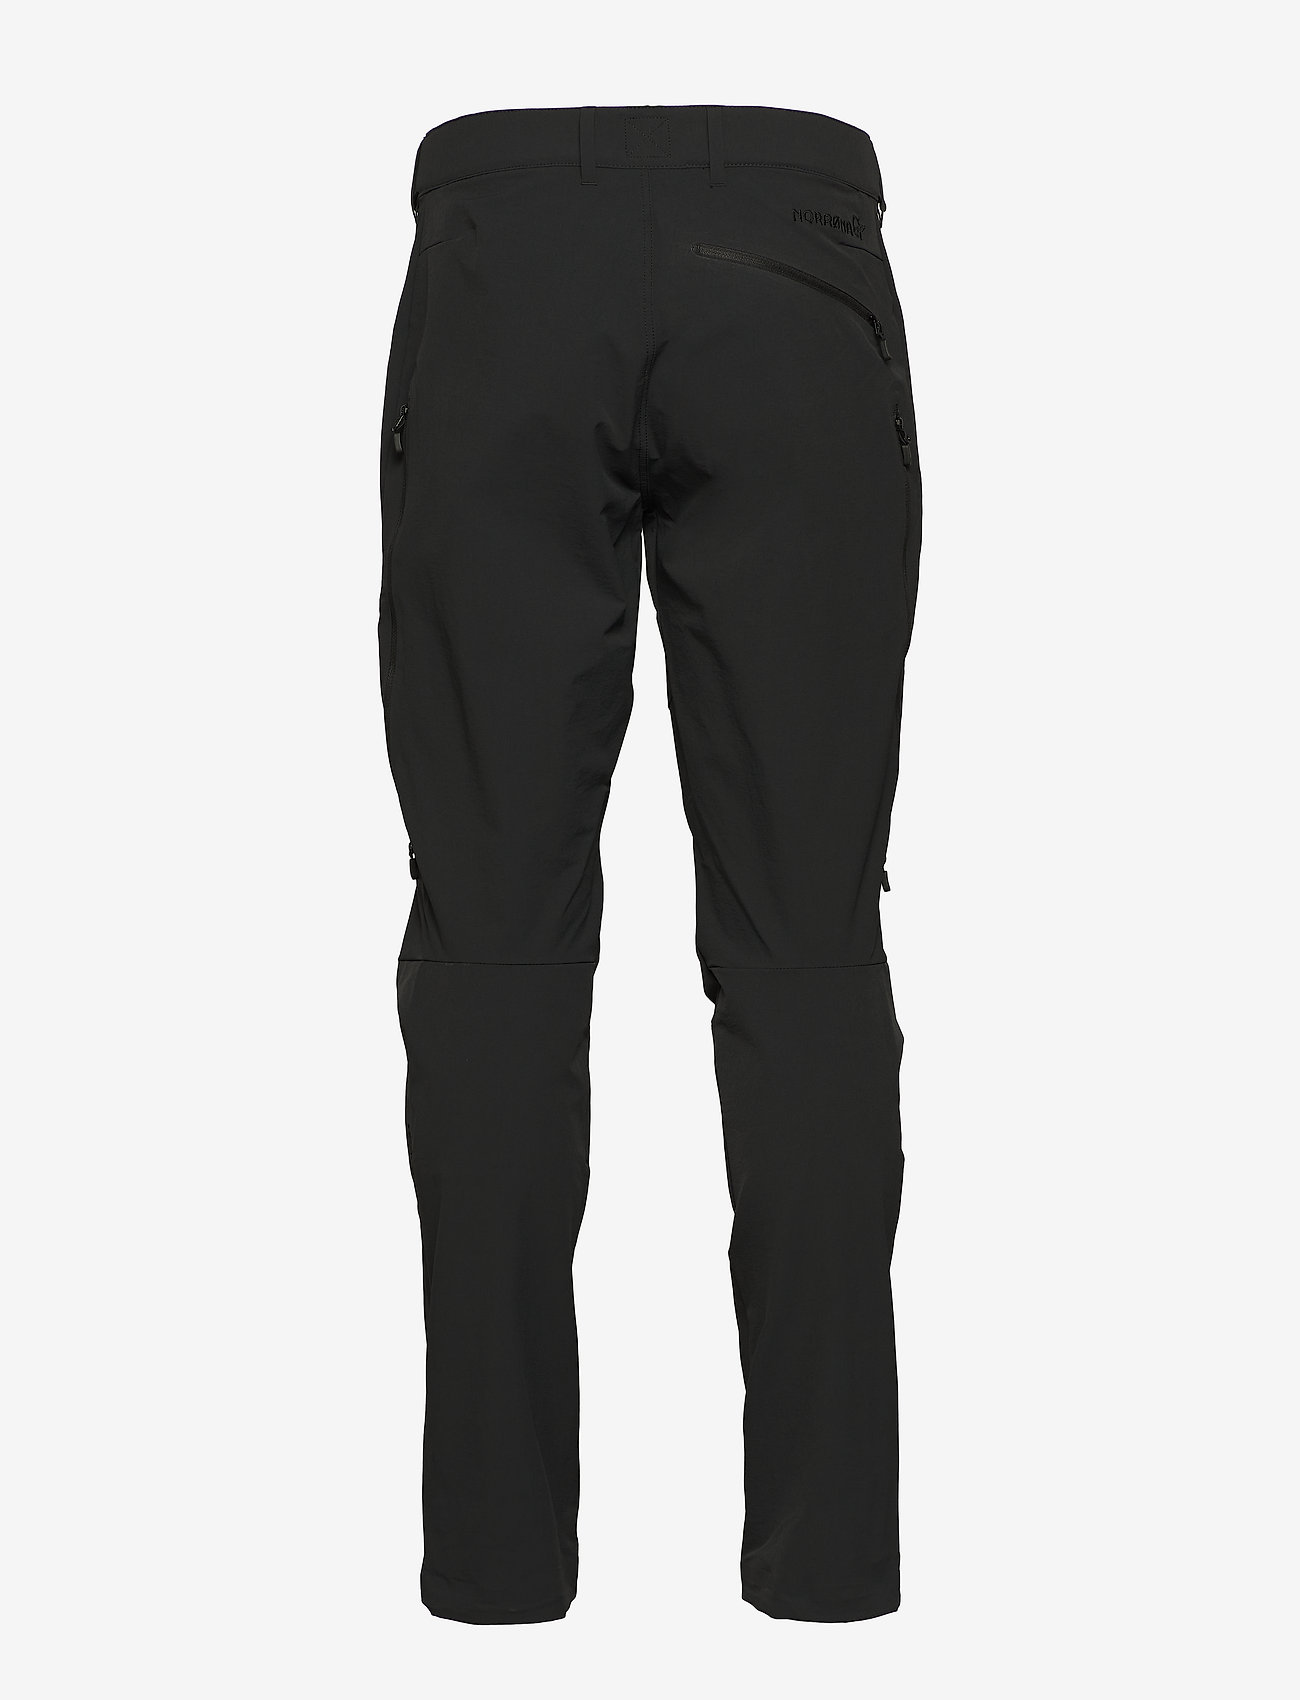 Norrøna - falketind flex1 Pants M's - softshellhose - caviar - 1